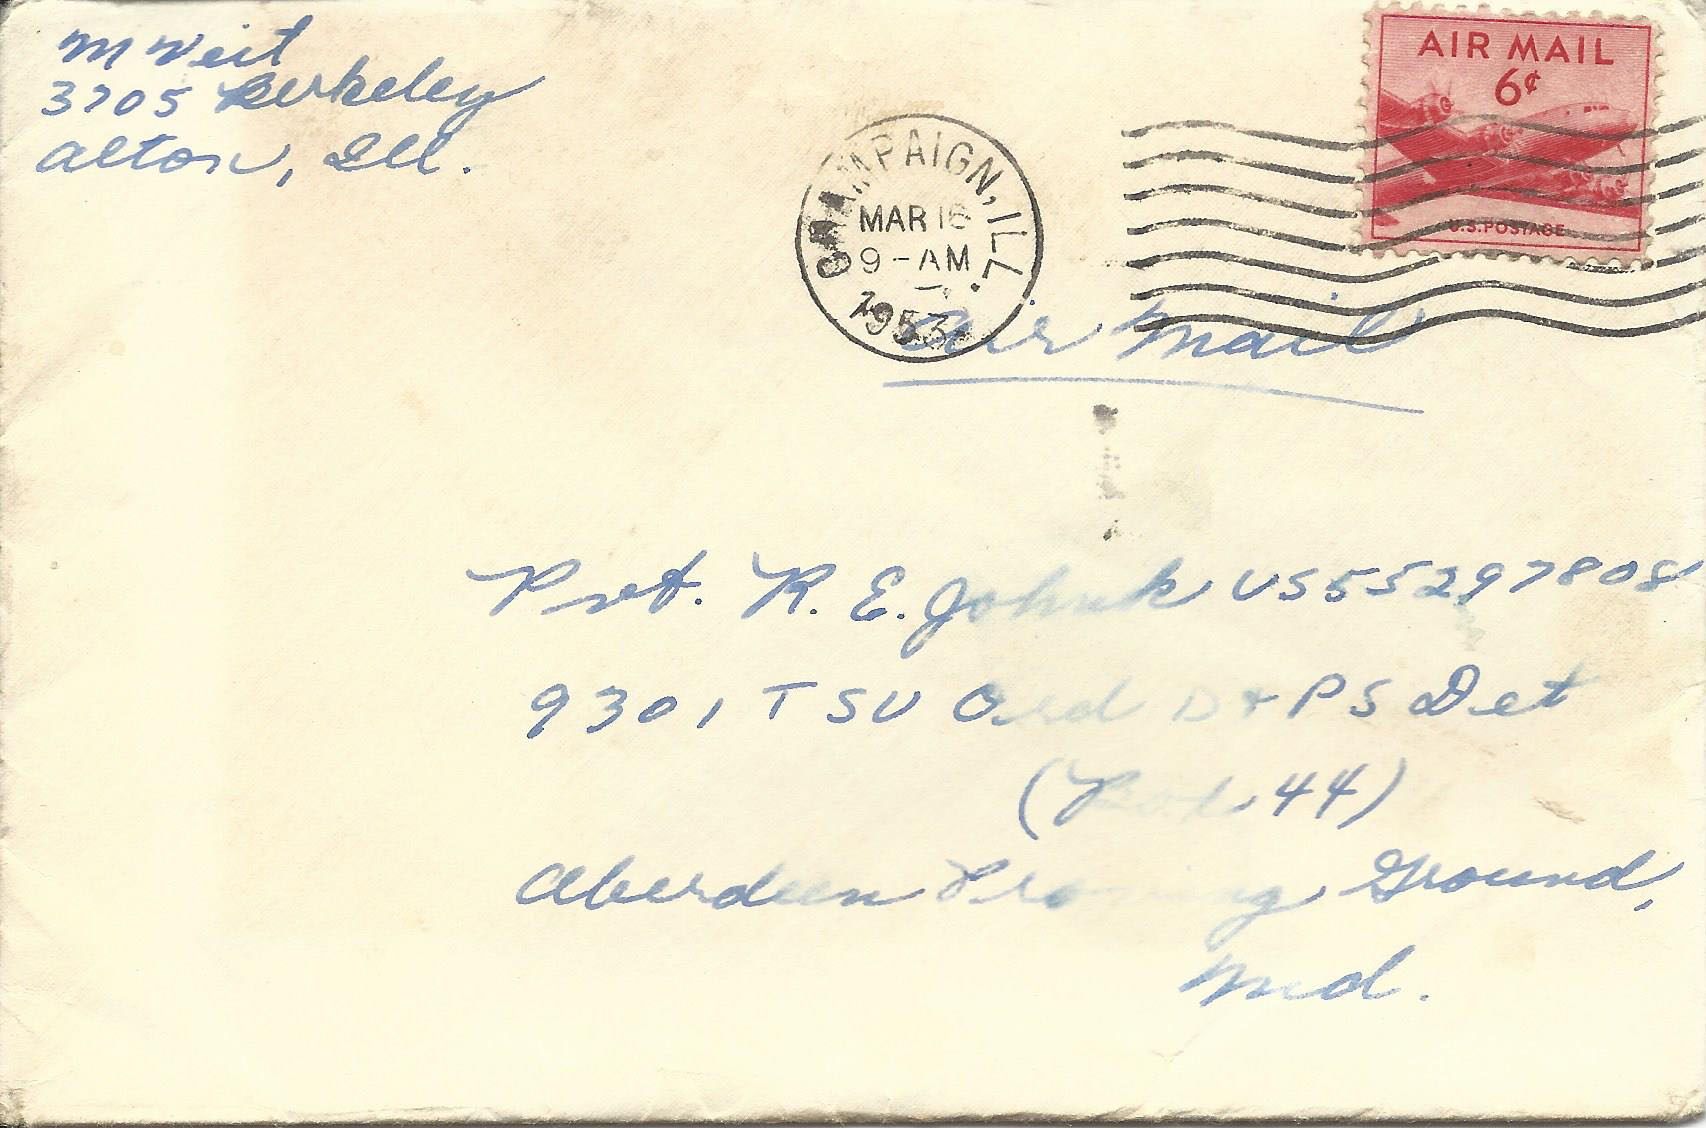 Mar. 14, 1953 (Marj) Envelope